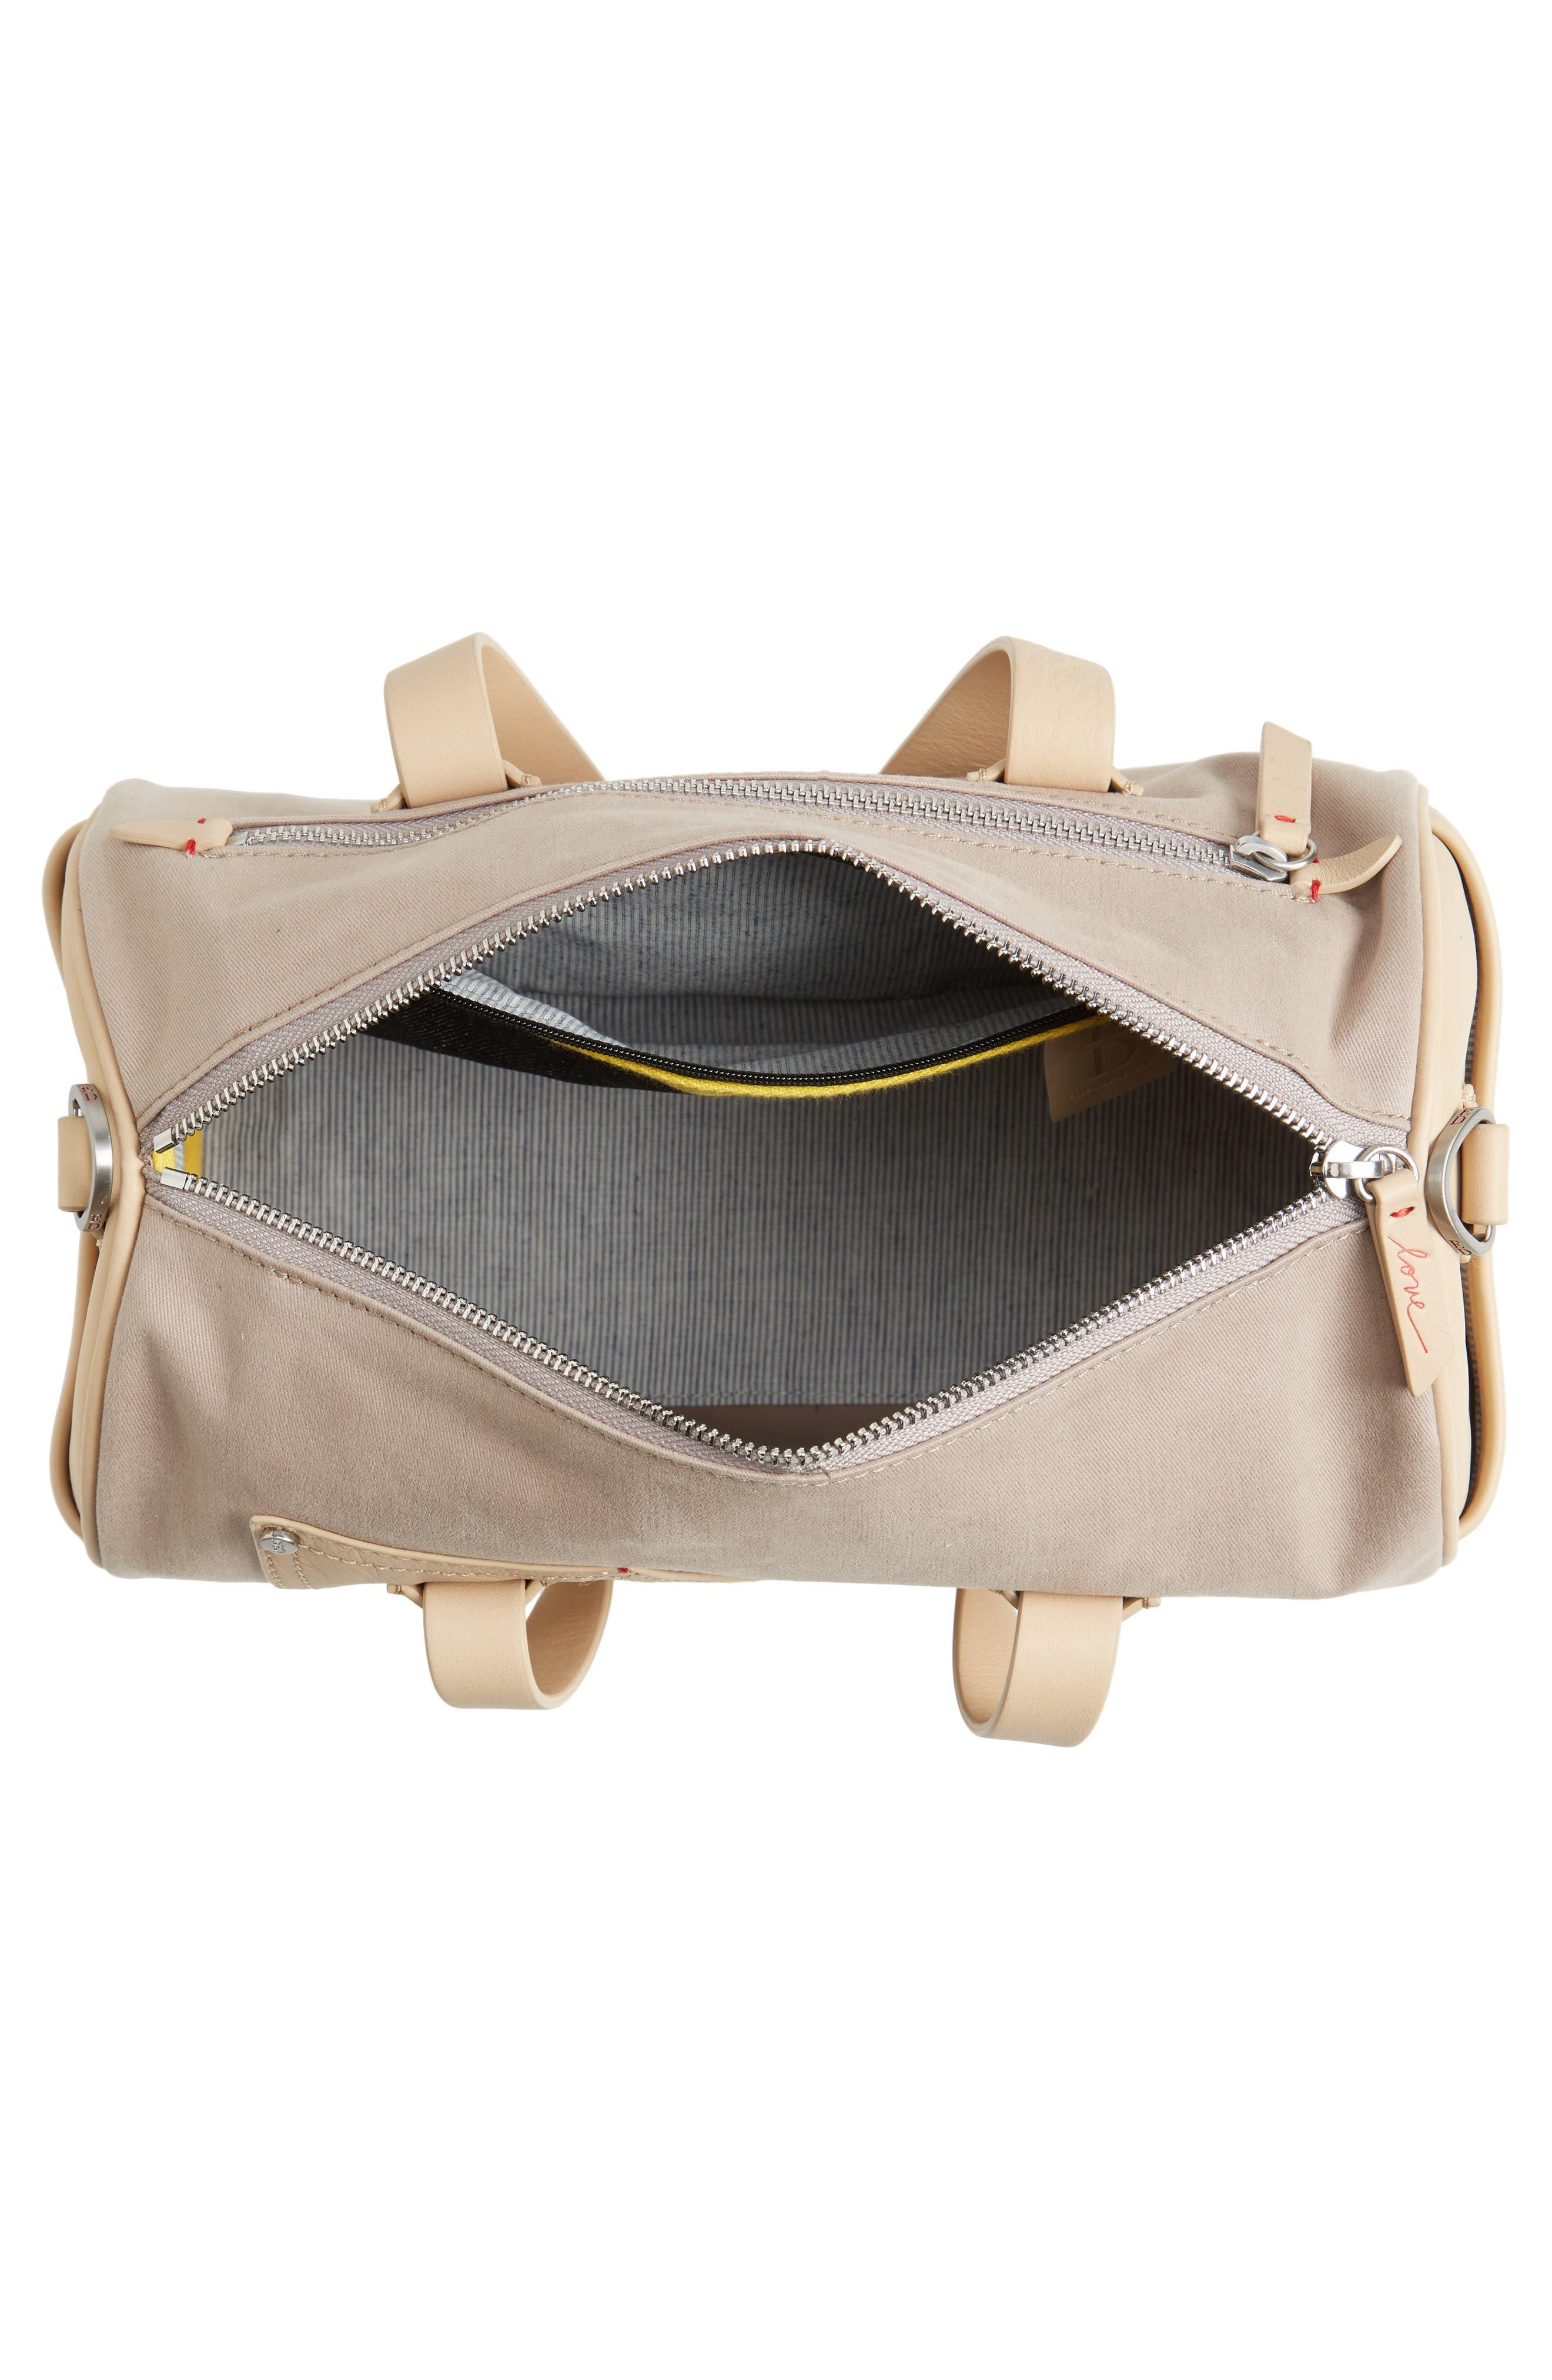 Mini Carml Leather & Canvas Barrel Bag,                             Alternate thumbnail 4, color,                             050